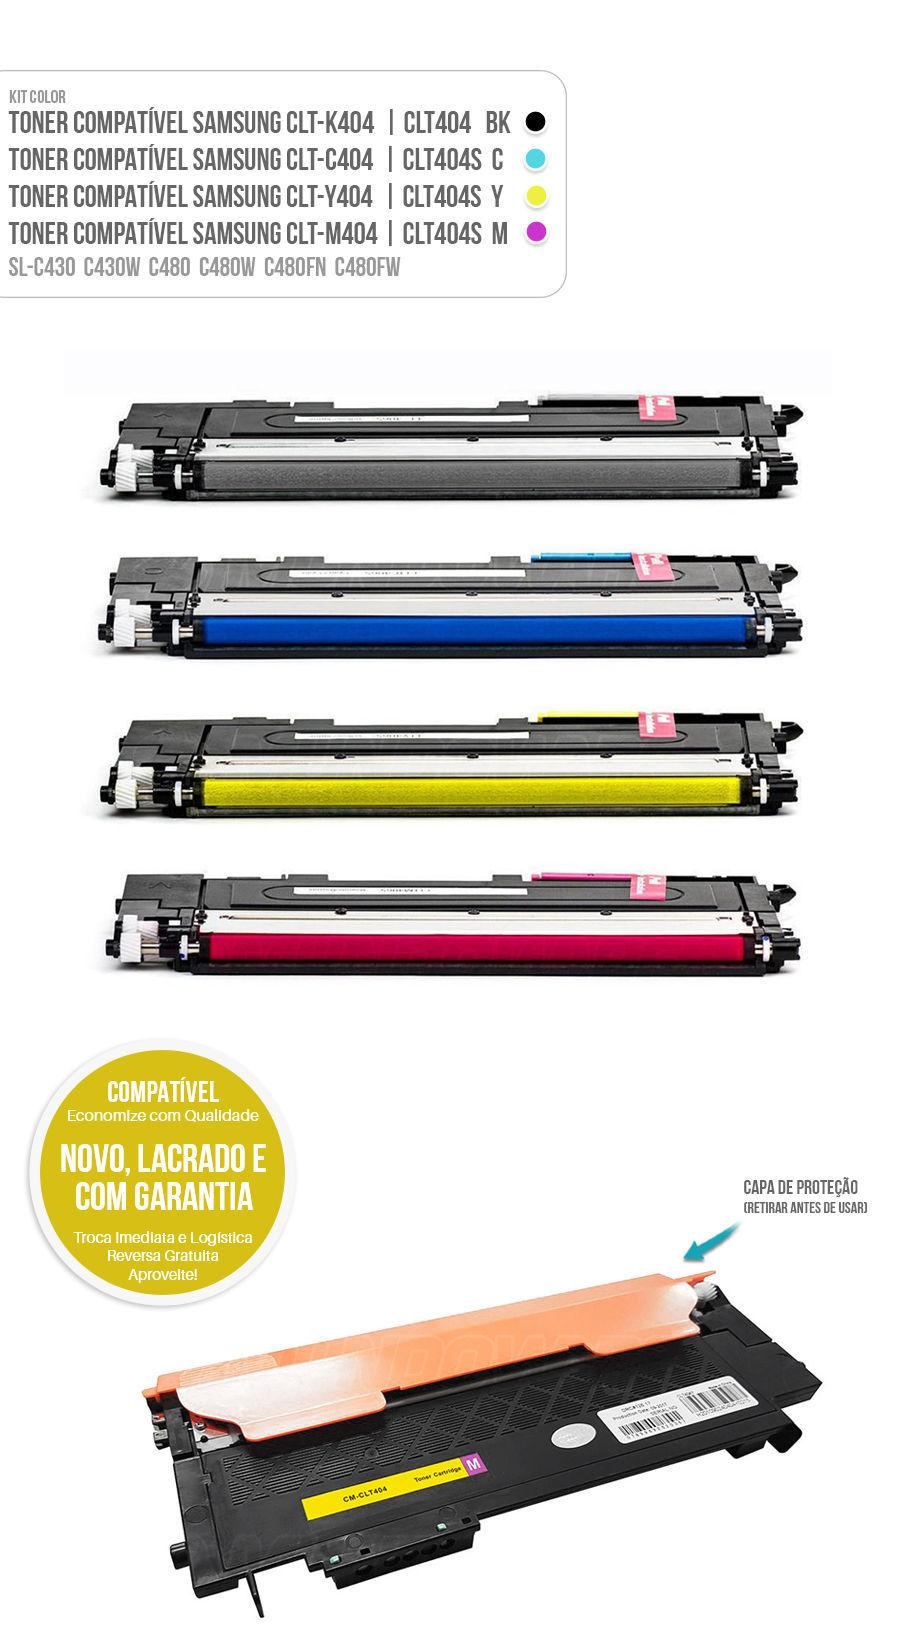 Kit Colorido de Toner para SL-C430 SL-C430W SL-C480 SL-C480W SL-C480FN SL-C480FW Tonner CLT404 404S